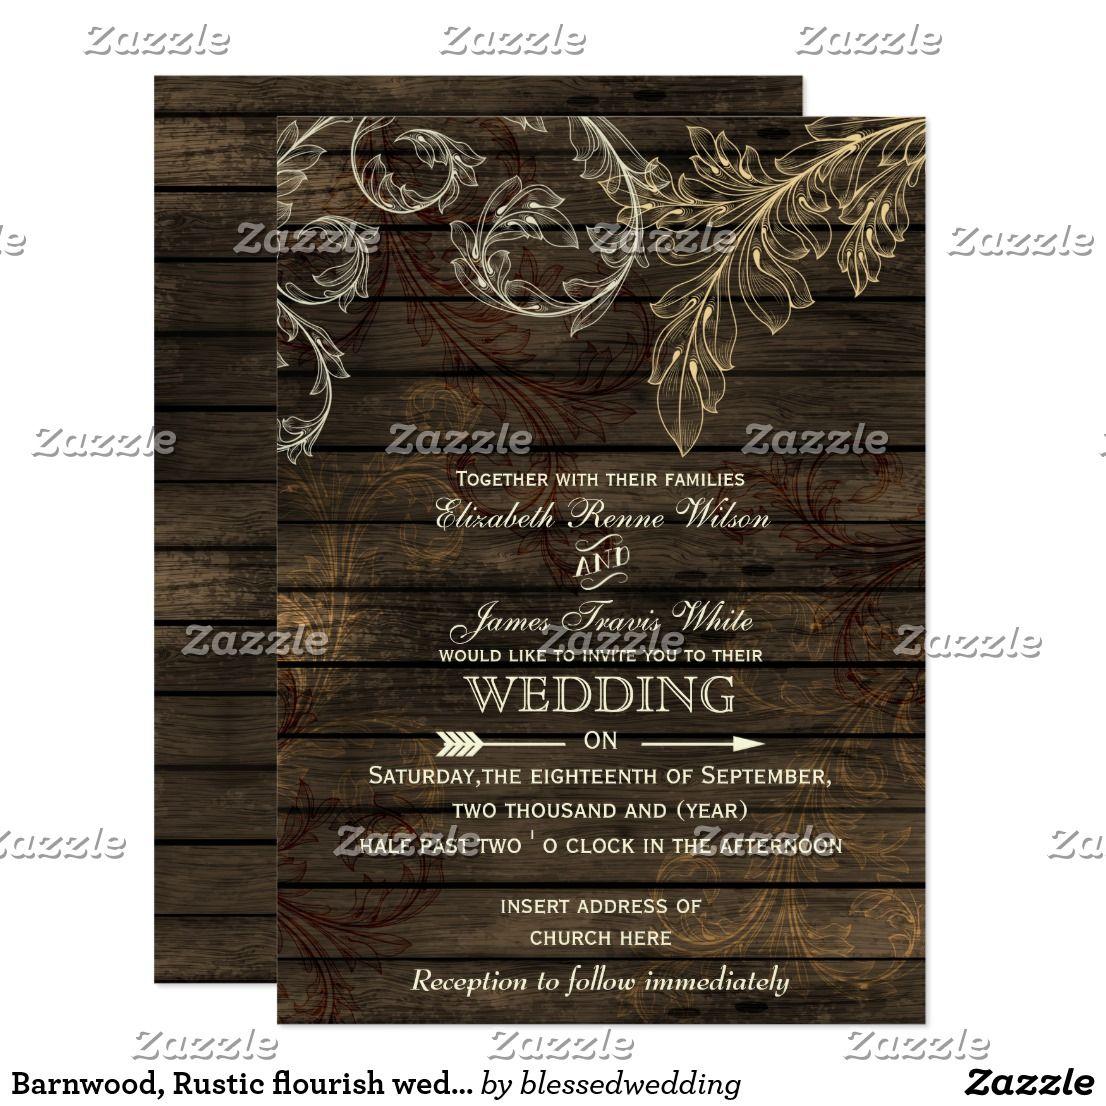 Barnwood, Rustic flourish wedding invitations | Best Invitations ...